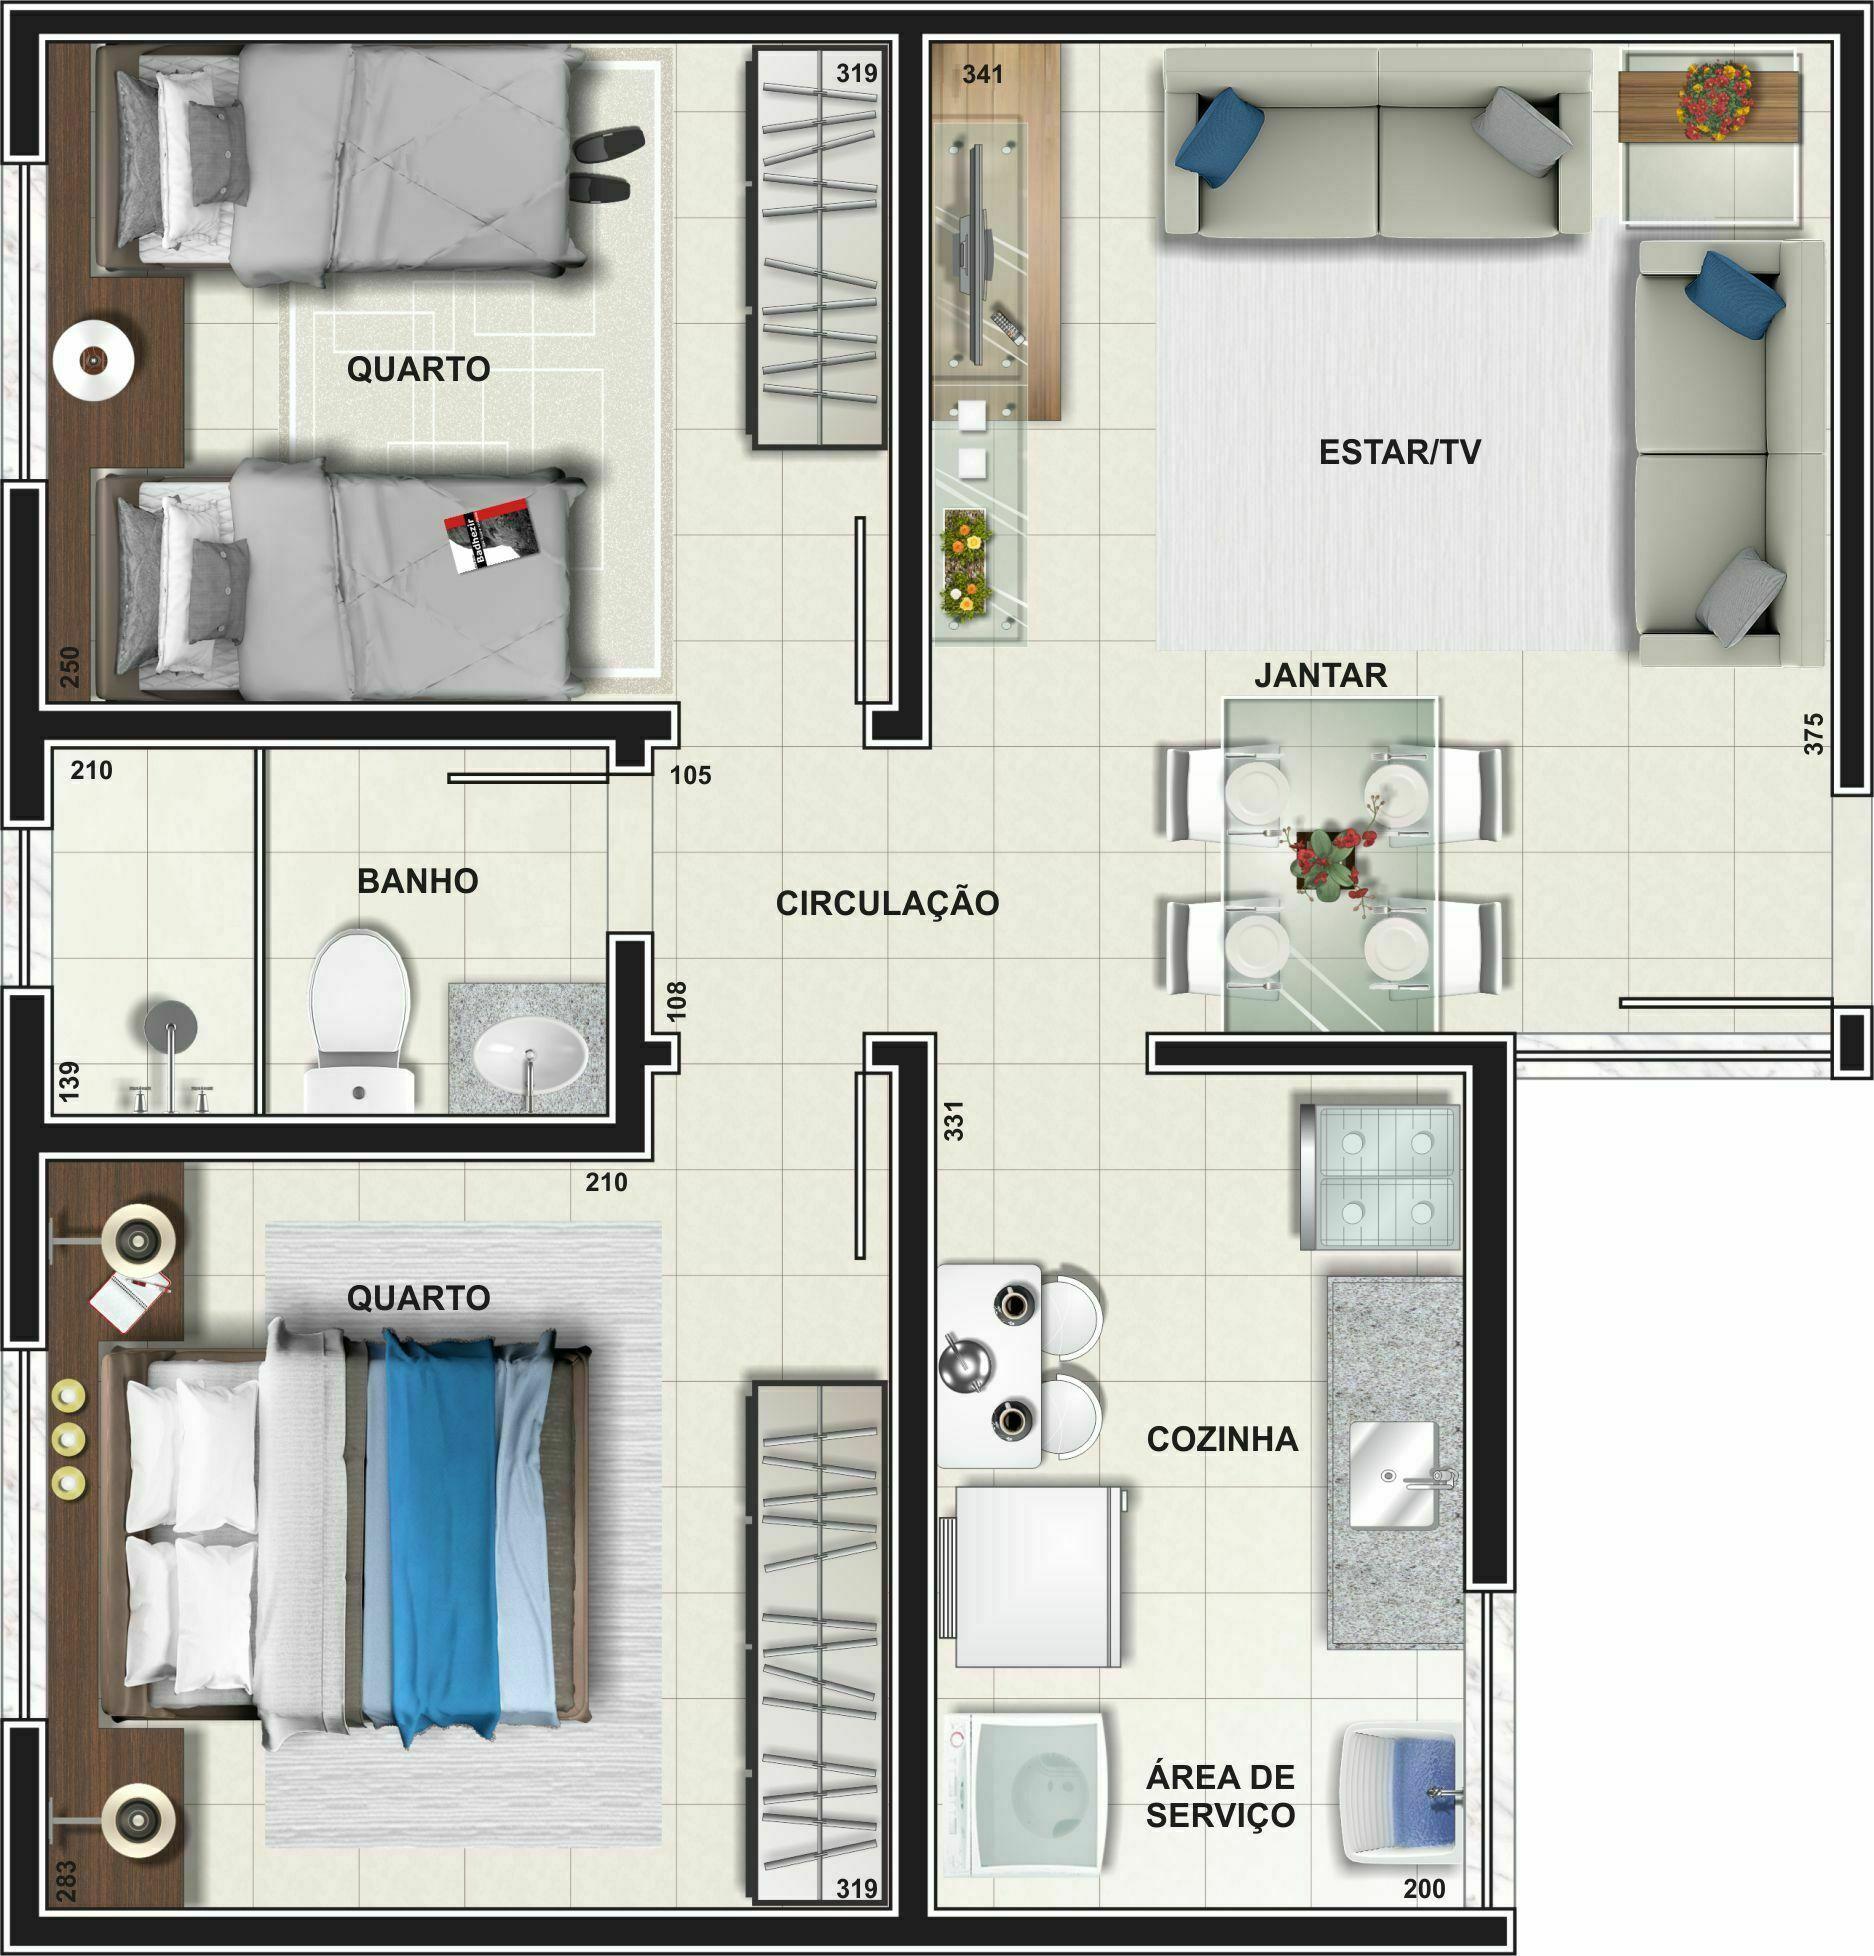 Planta Apartamento - Tipo 01 - 46,88 m²